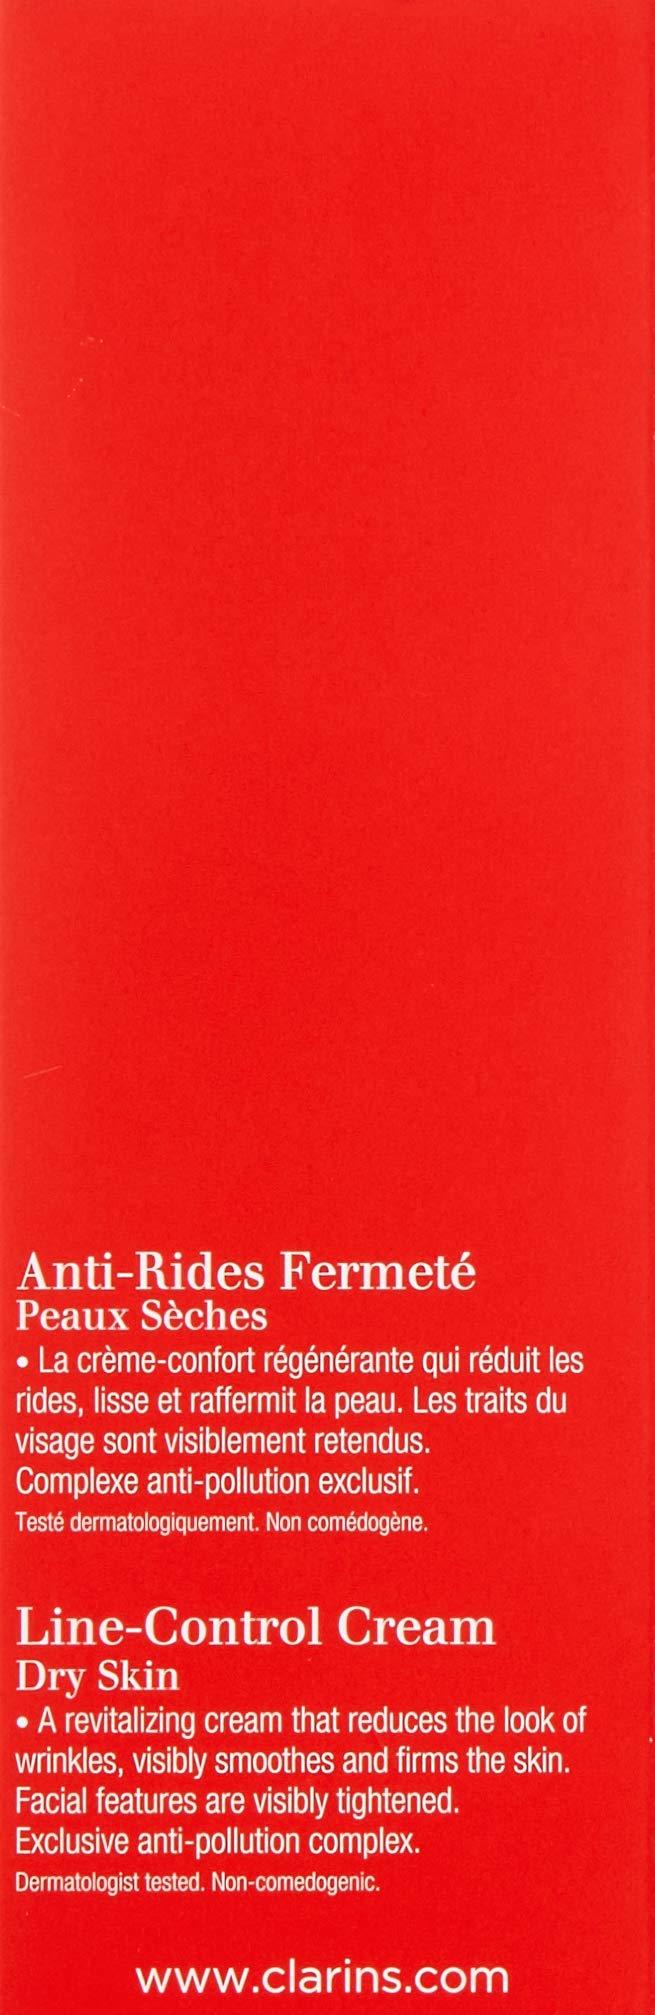 Clarins Men Crème Fermeté Anti-Rides 50 Ml 1 Unidad 50 ml